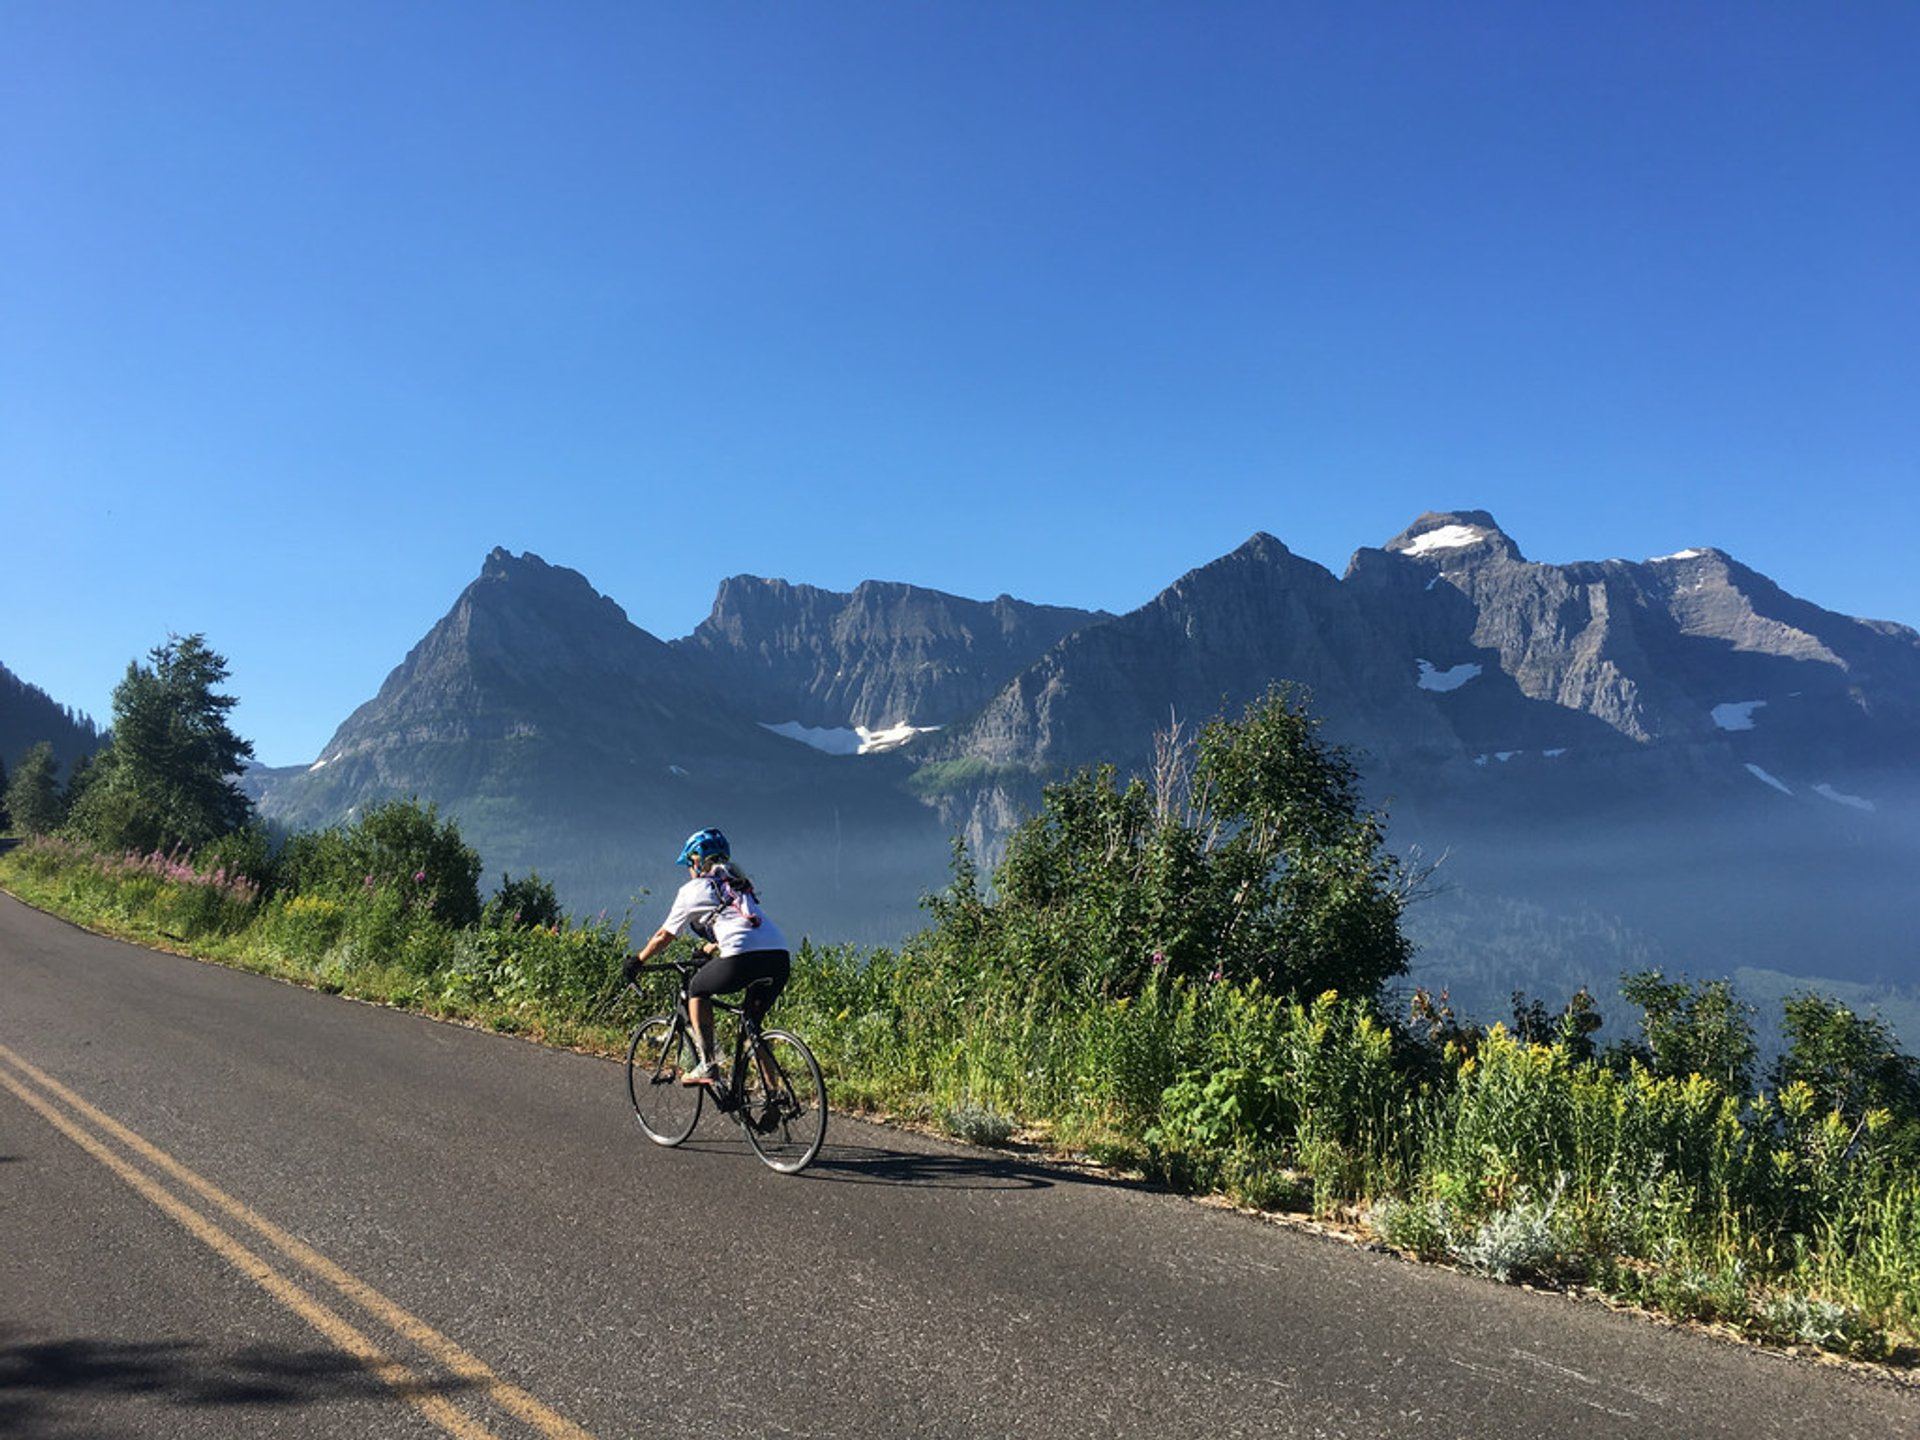 Mountain Biking in Banff & Jasper National Parks 2020 - Best Time